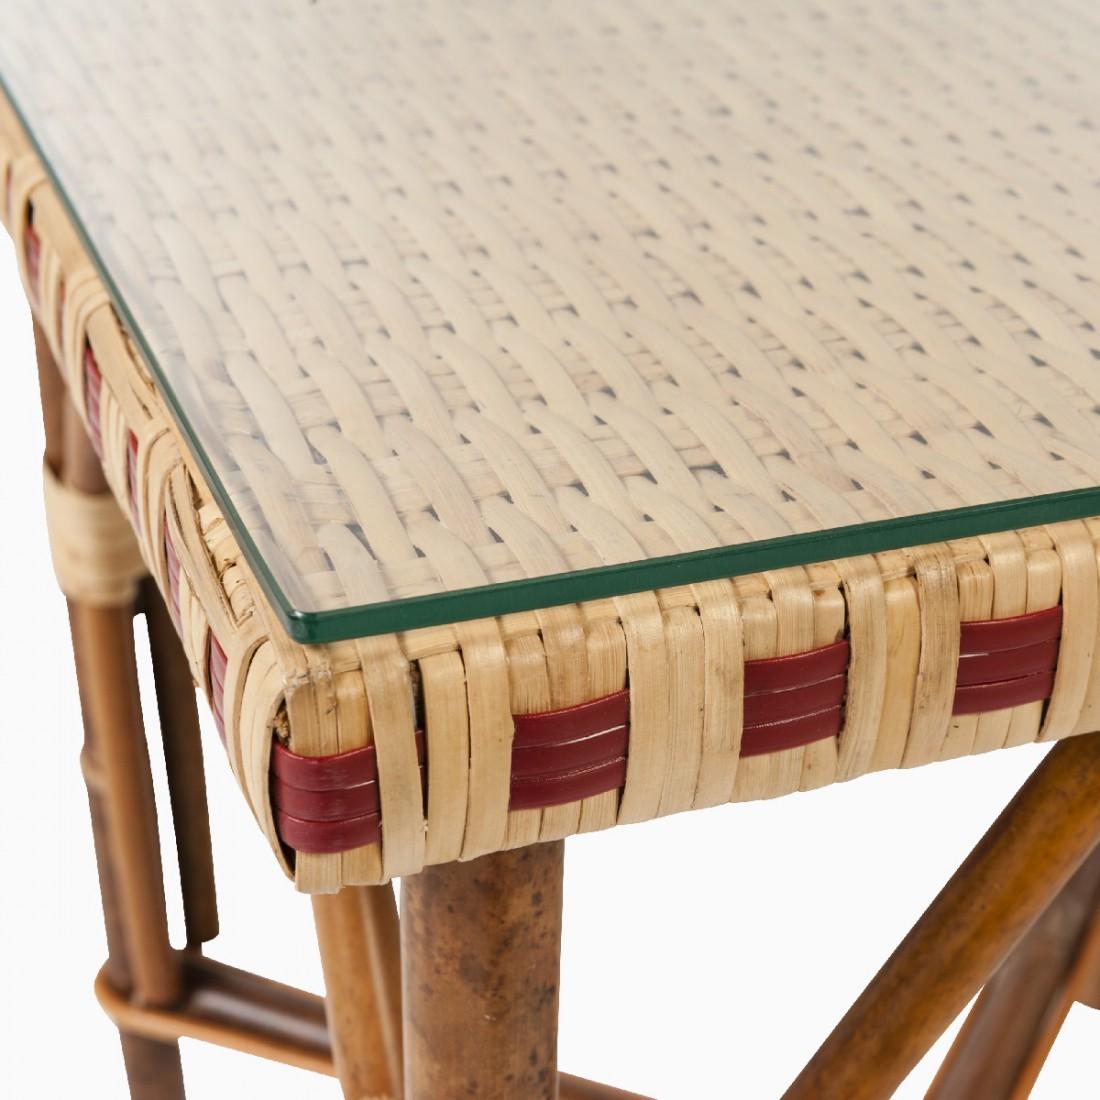 verre pour table basse en rotin bagatelle table en rotin. Black Bedroom Furniture Sets. Home Design Ideas